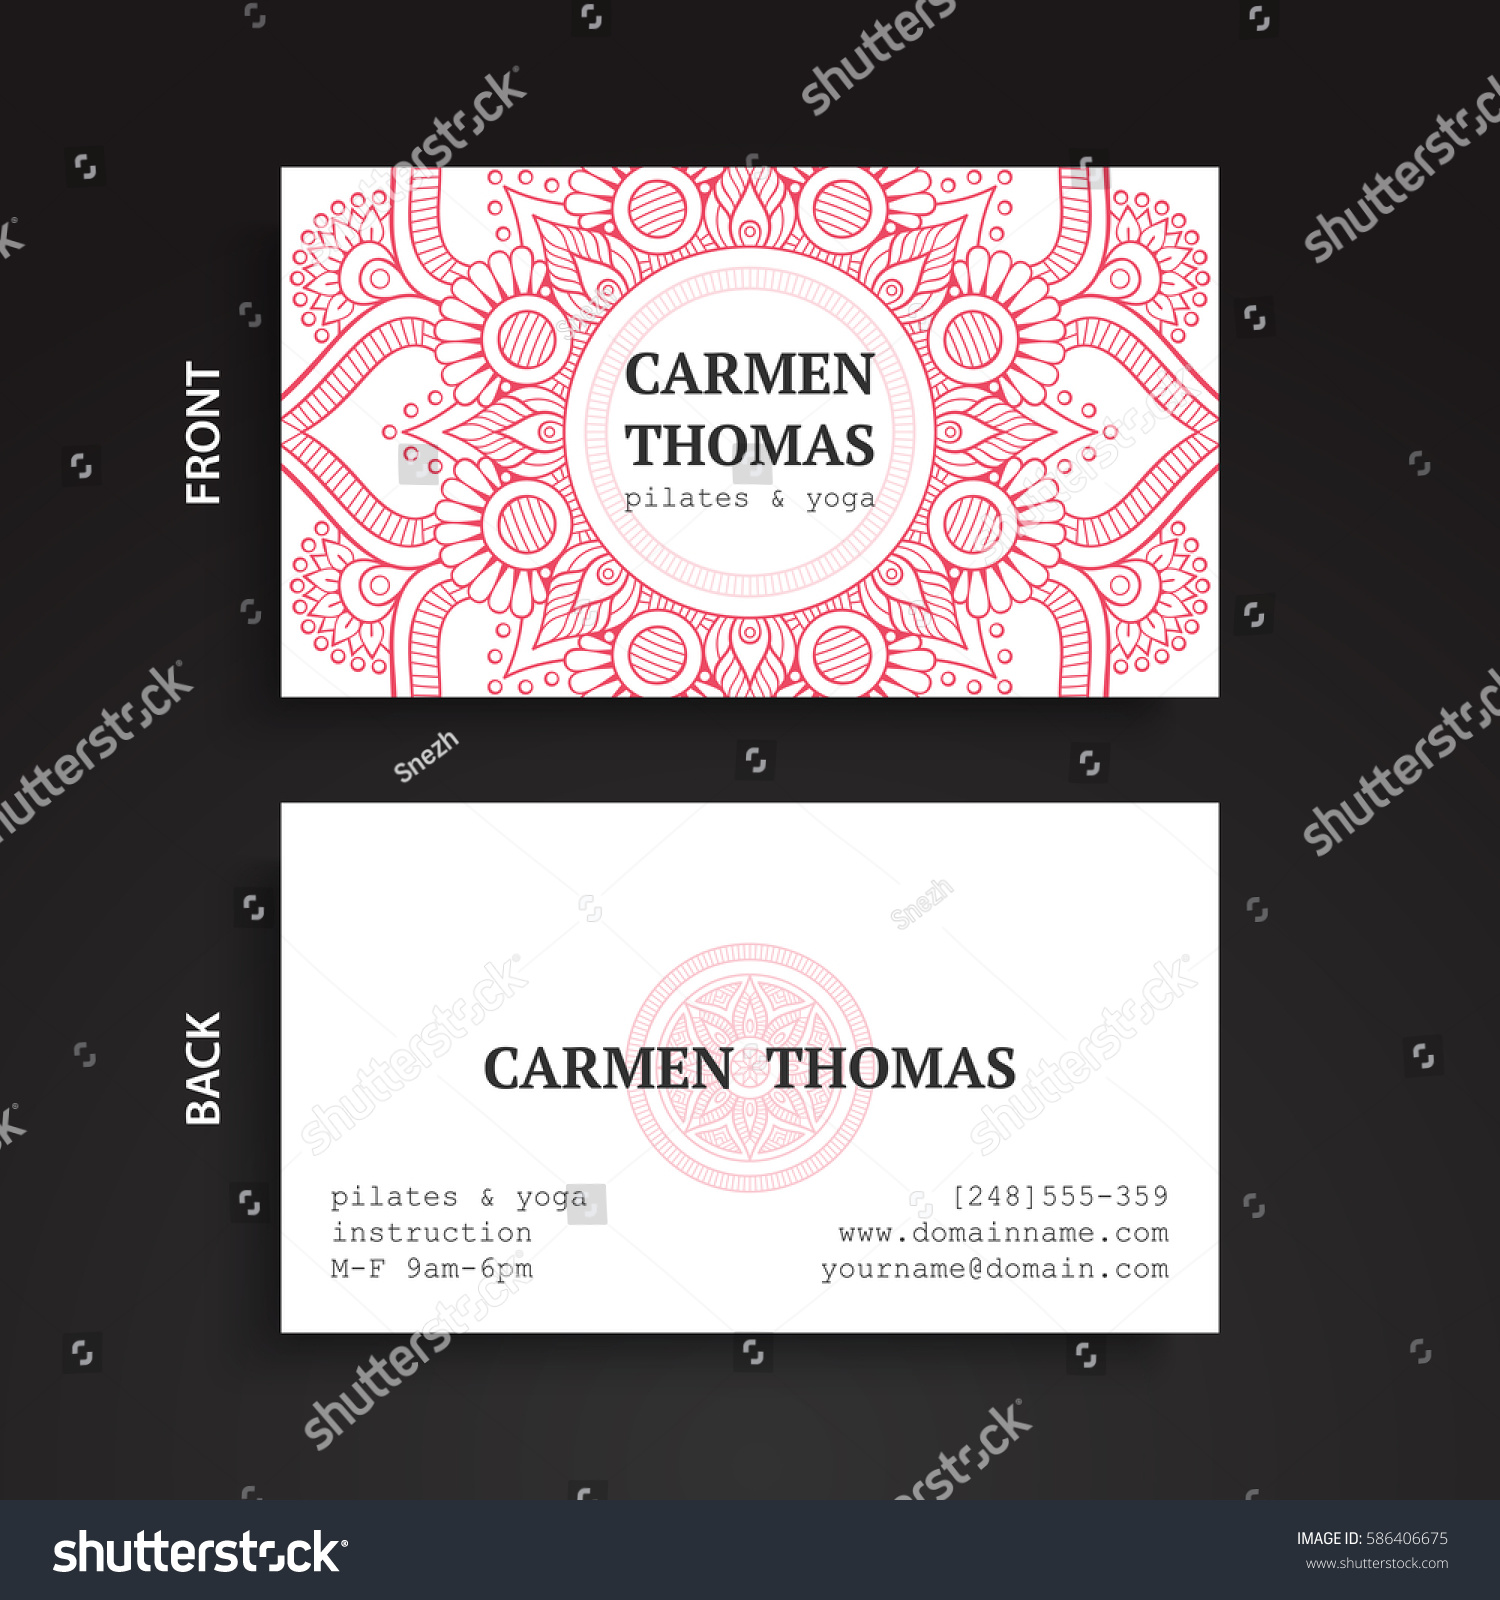 Luxury Business Cards Vintage Decorative Elements Stock Vector ...